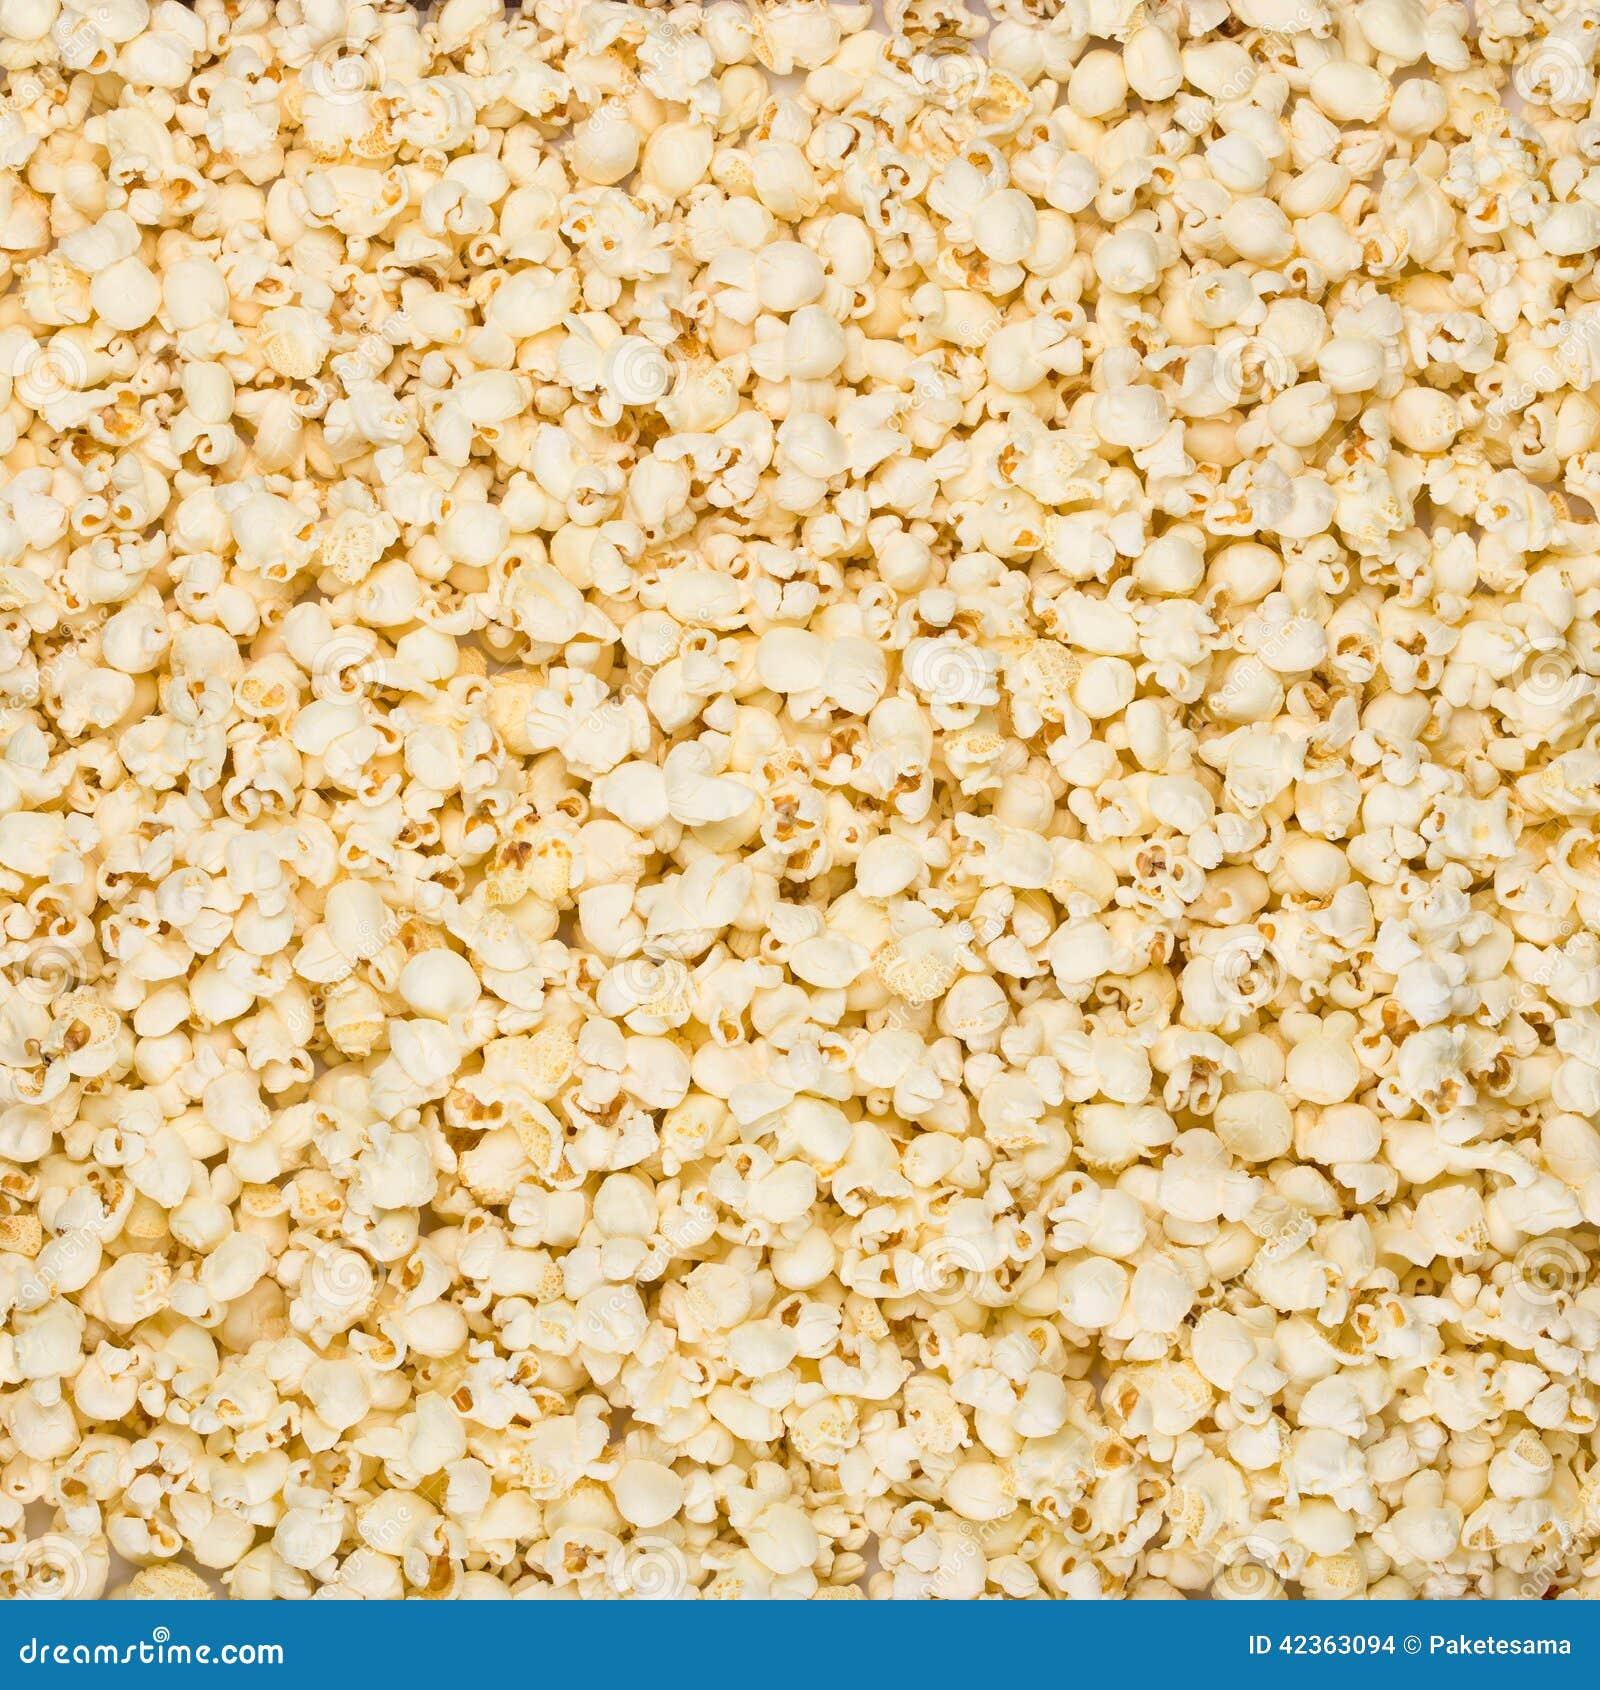 Popcorn Wallpaper: Popcorn Background Stock Photo